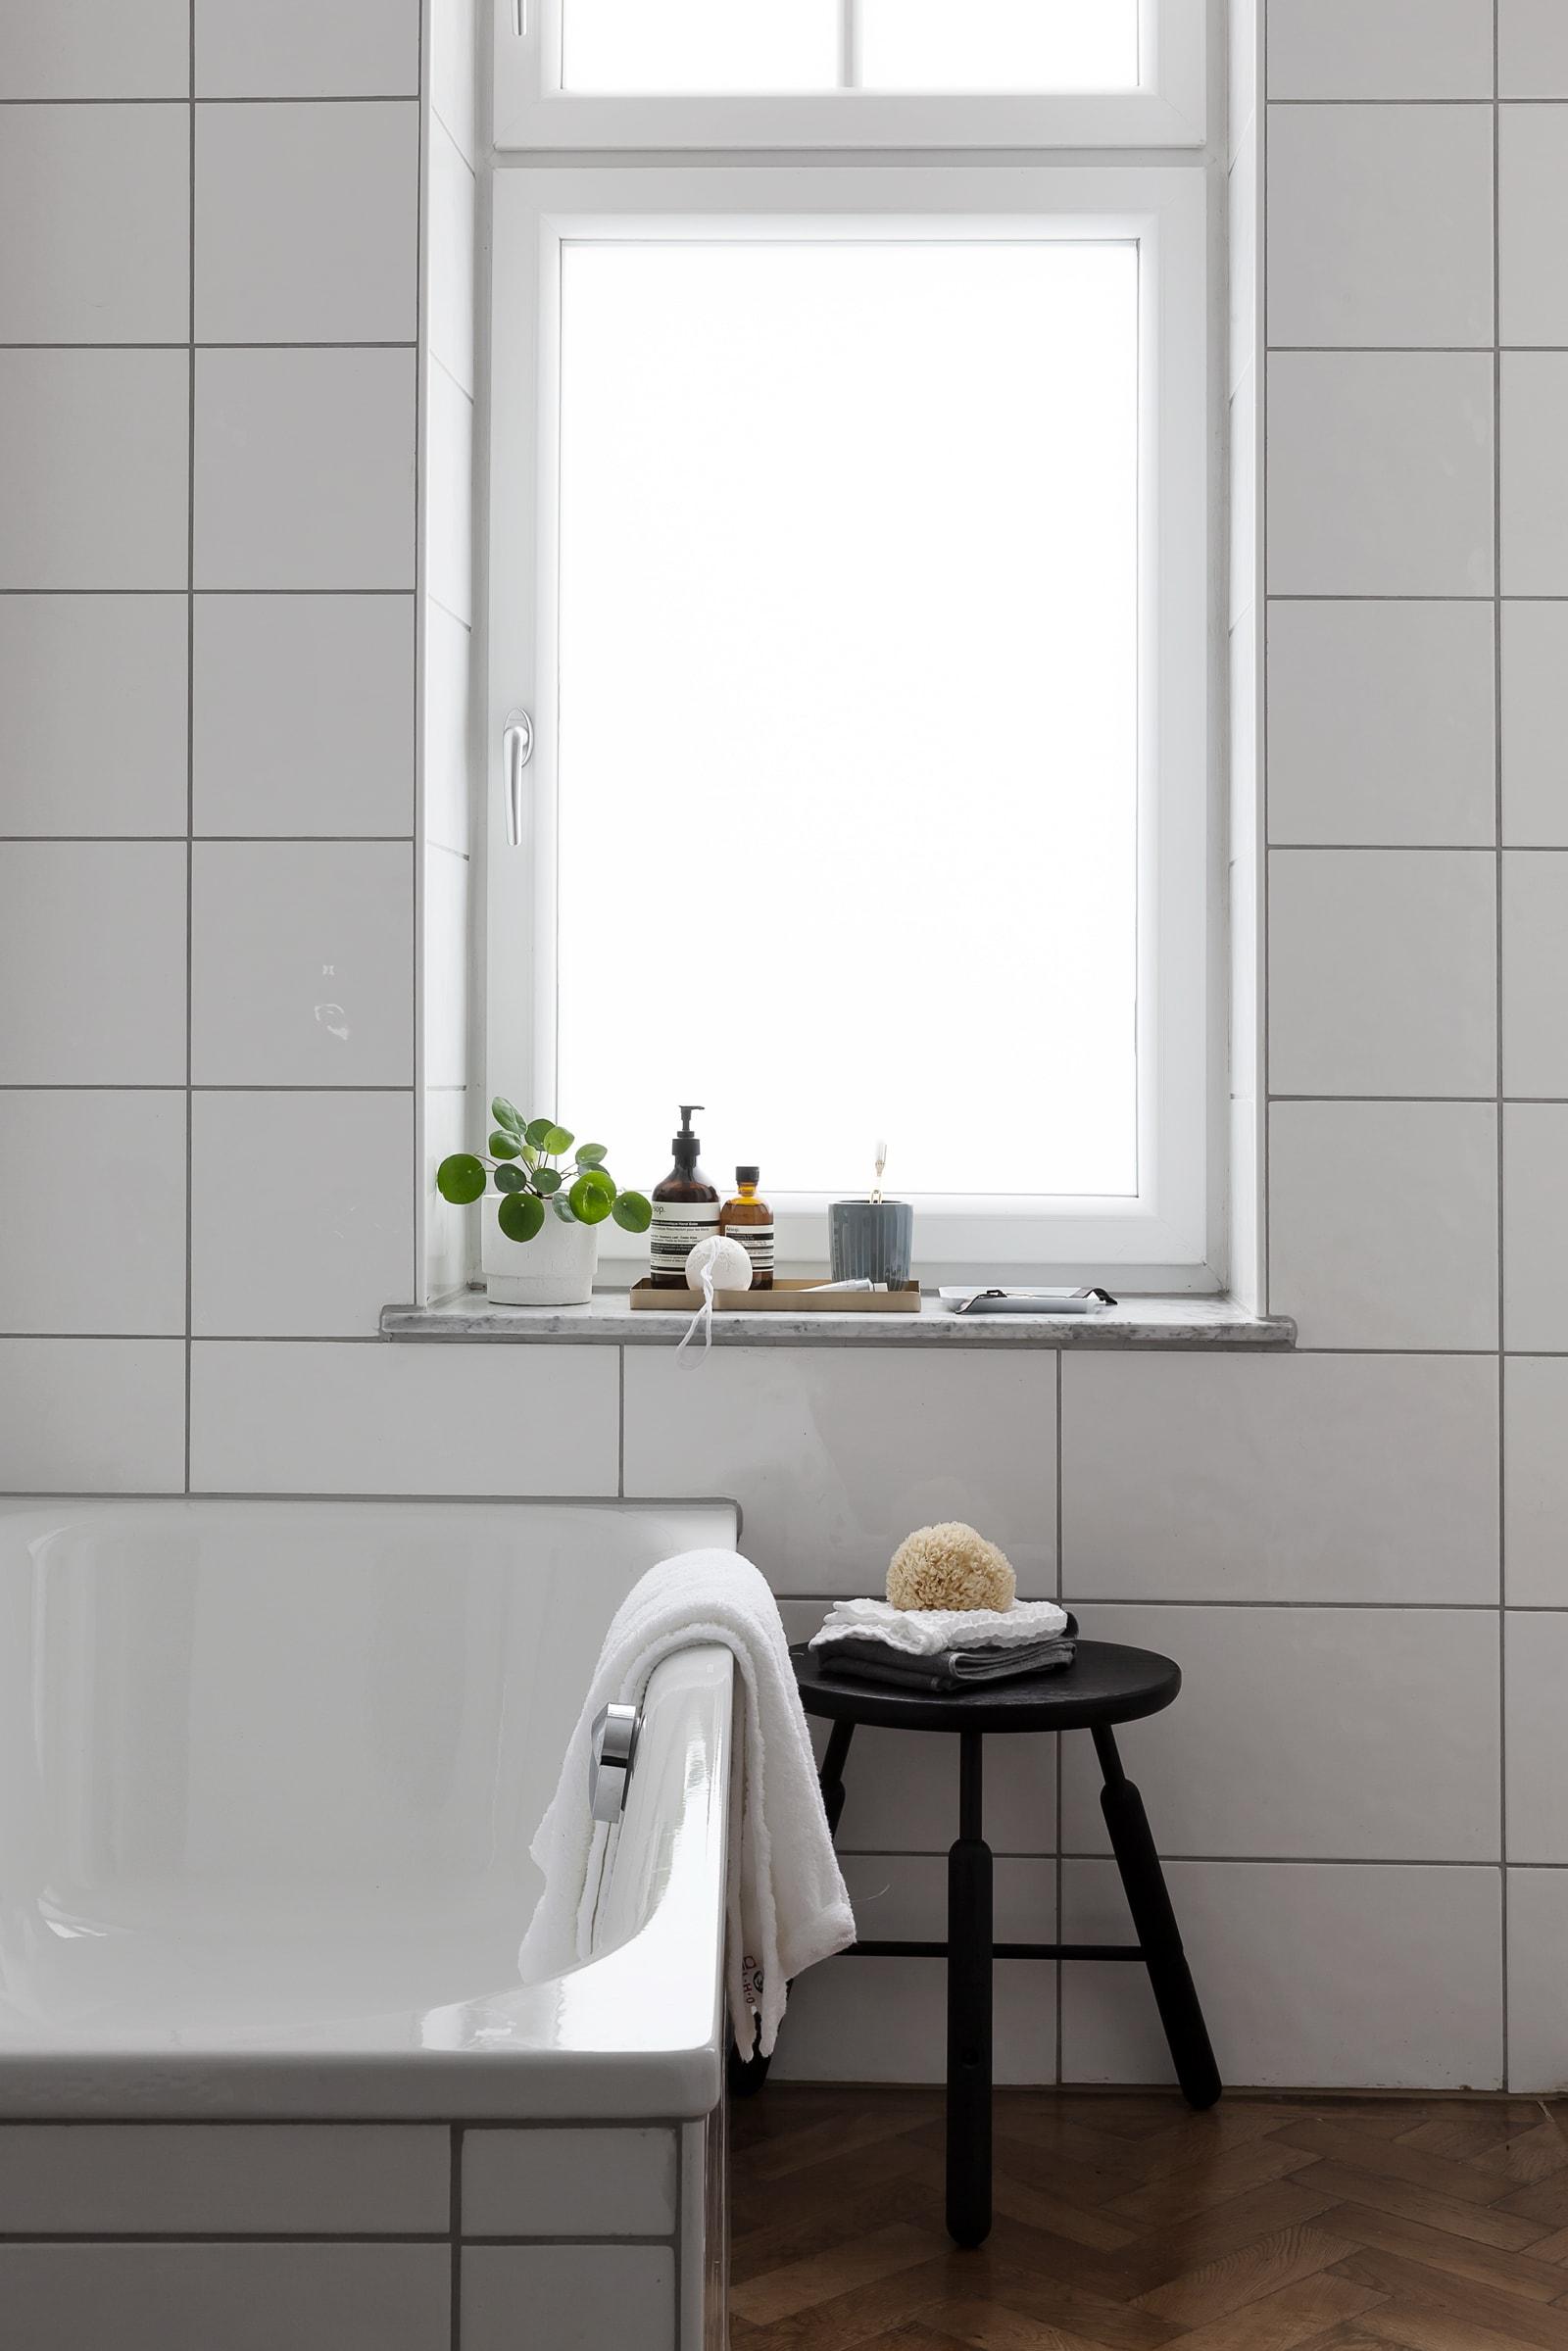 Peek into our bathroom - COCO LAPINE DESIGNCOCO LAPINE DESIGN